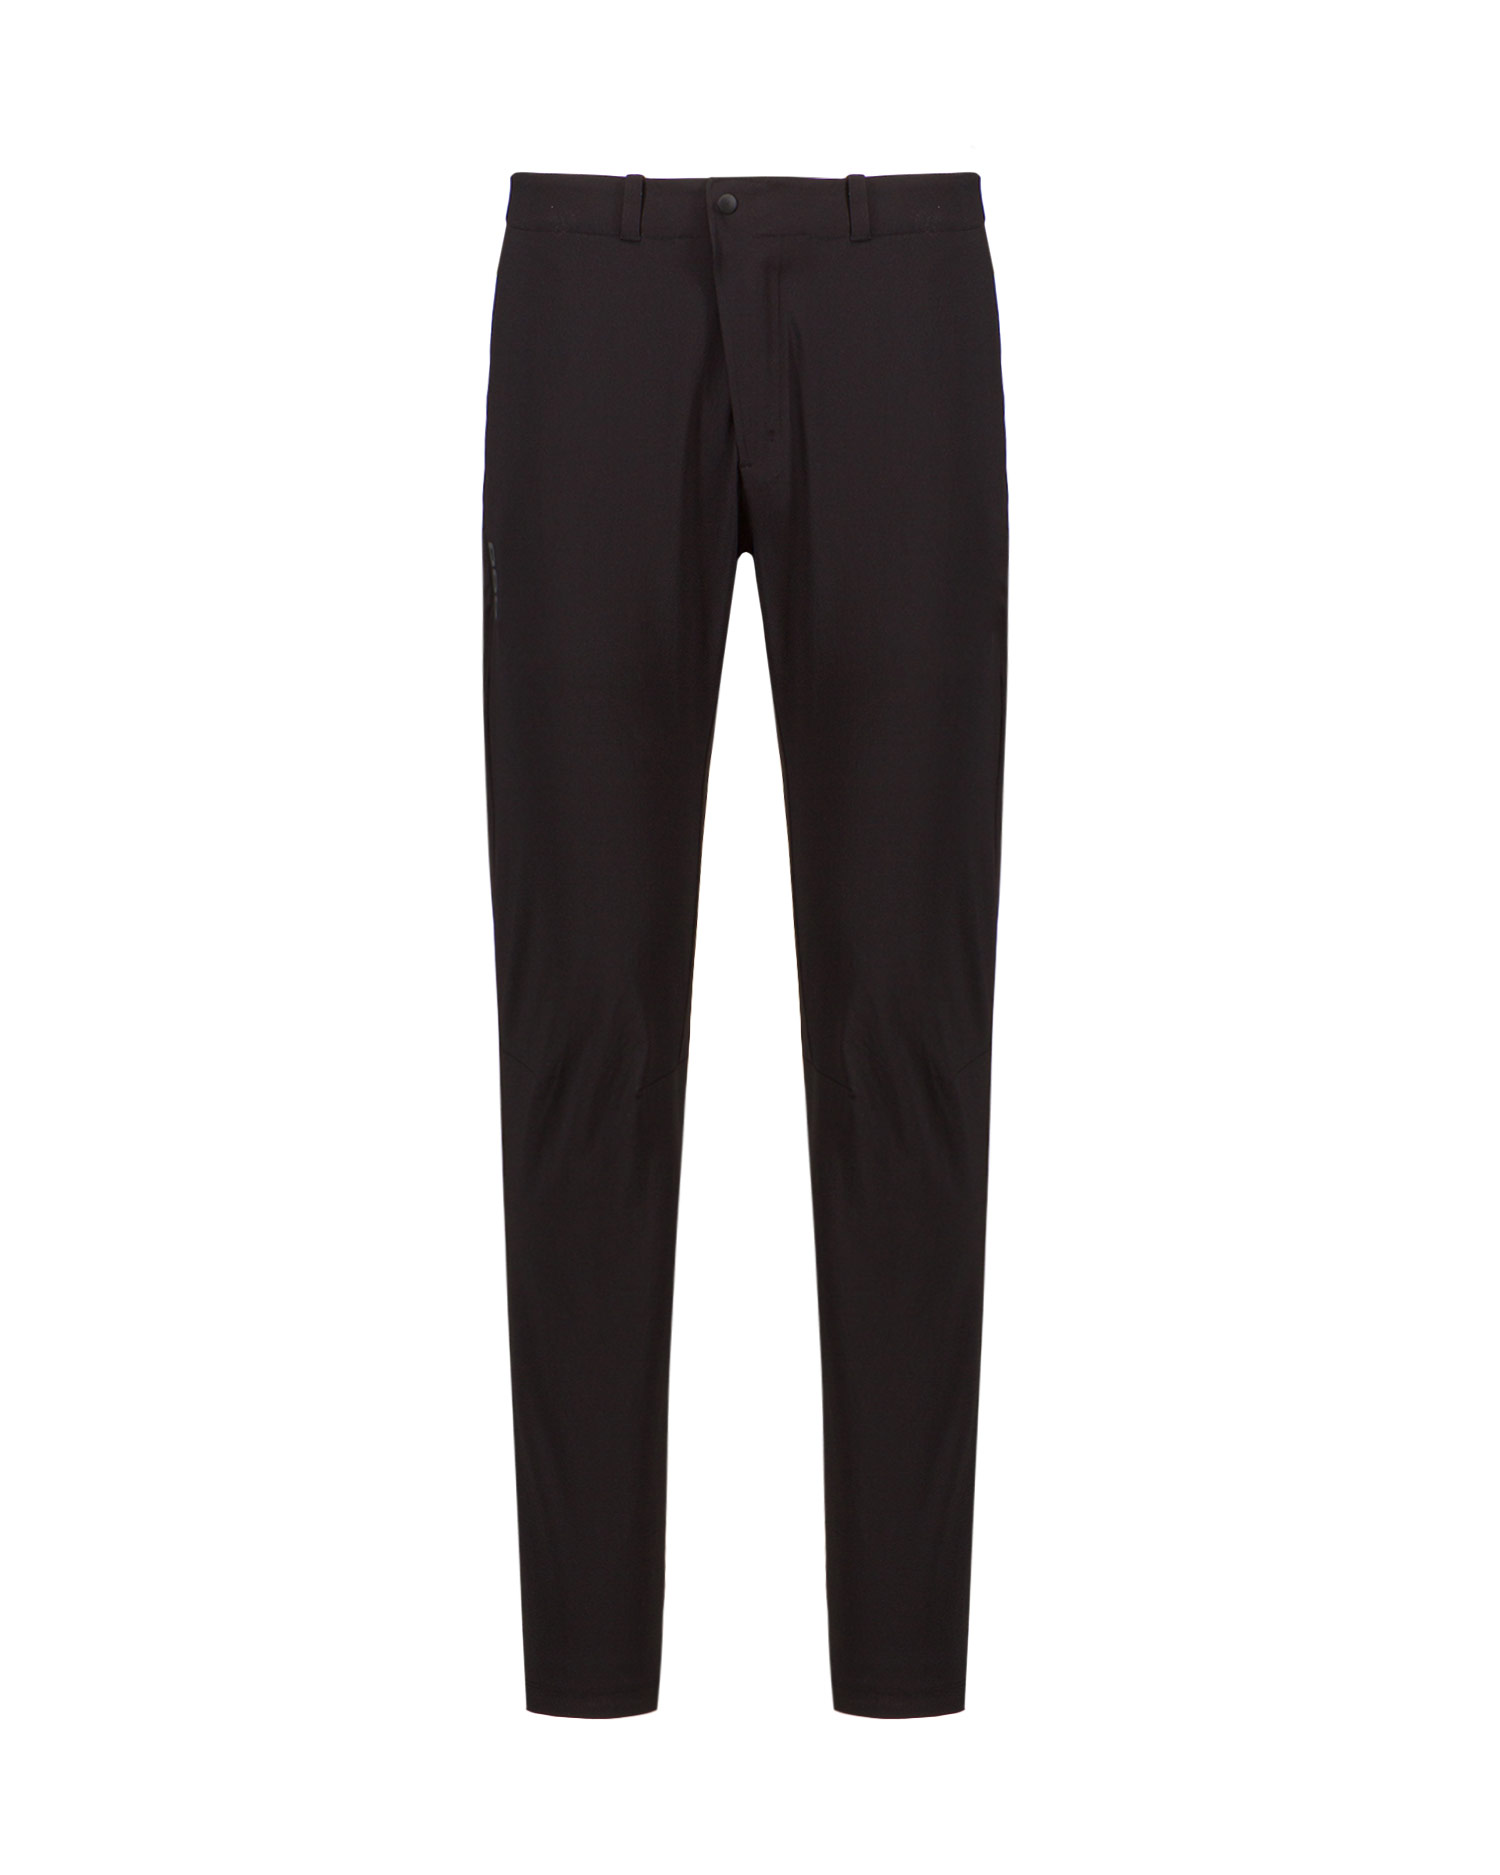 Kalhoty POC M'S TRANSCEND PANT